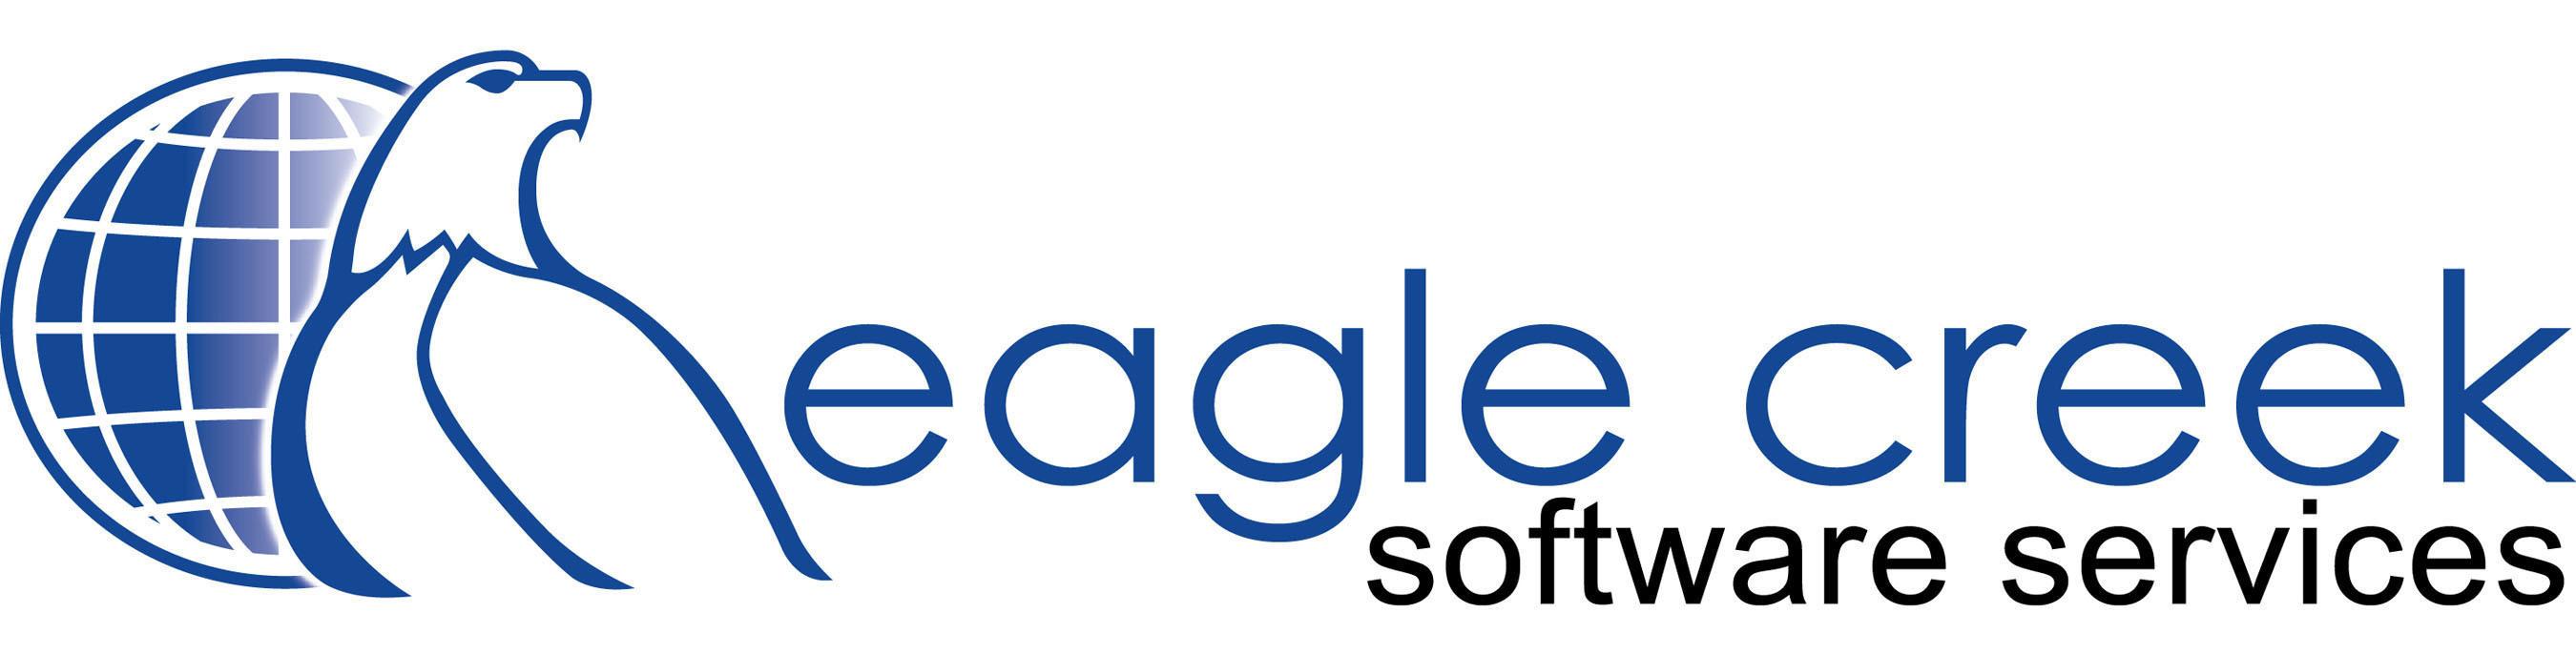 Eagle Creek Software Services logo. (PRNewsFoto/Eagle Creek Software Services) (PRNewsFoto/)